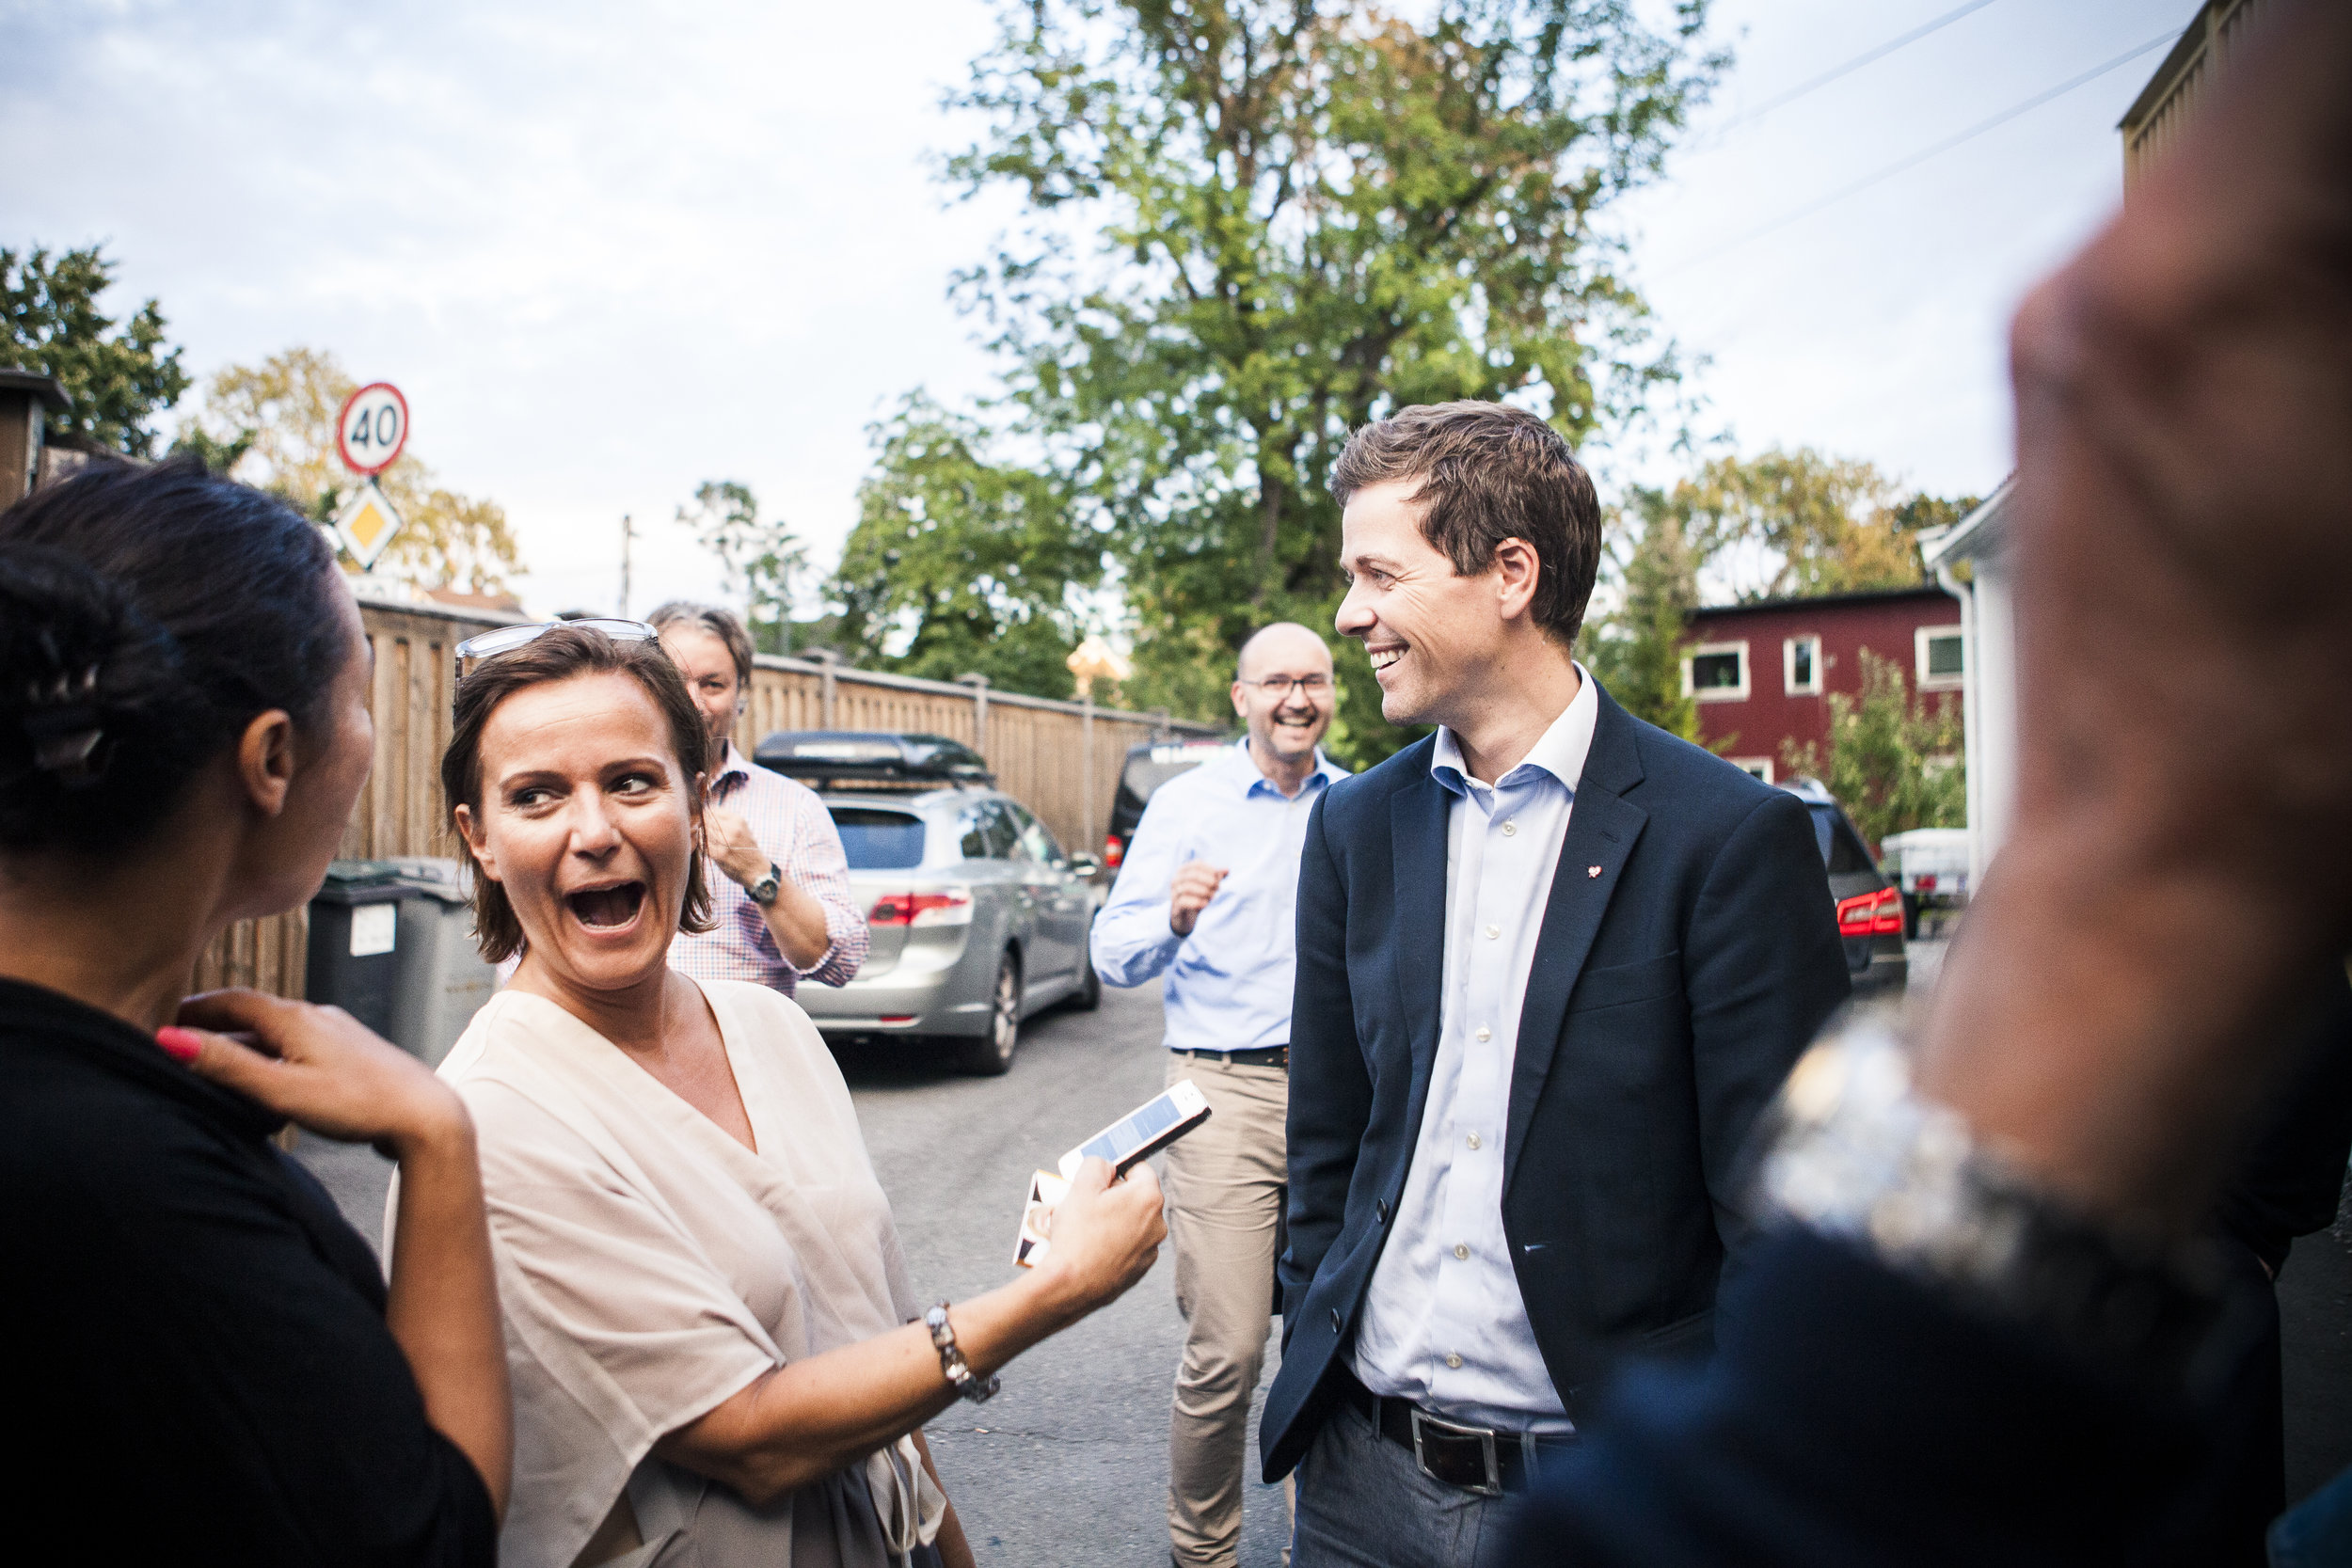 Journalist Synnøve Svabø and KRF politician Knut Arild Hareide